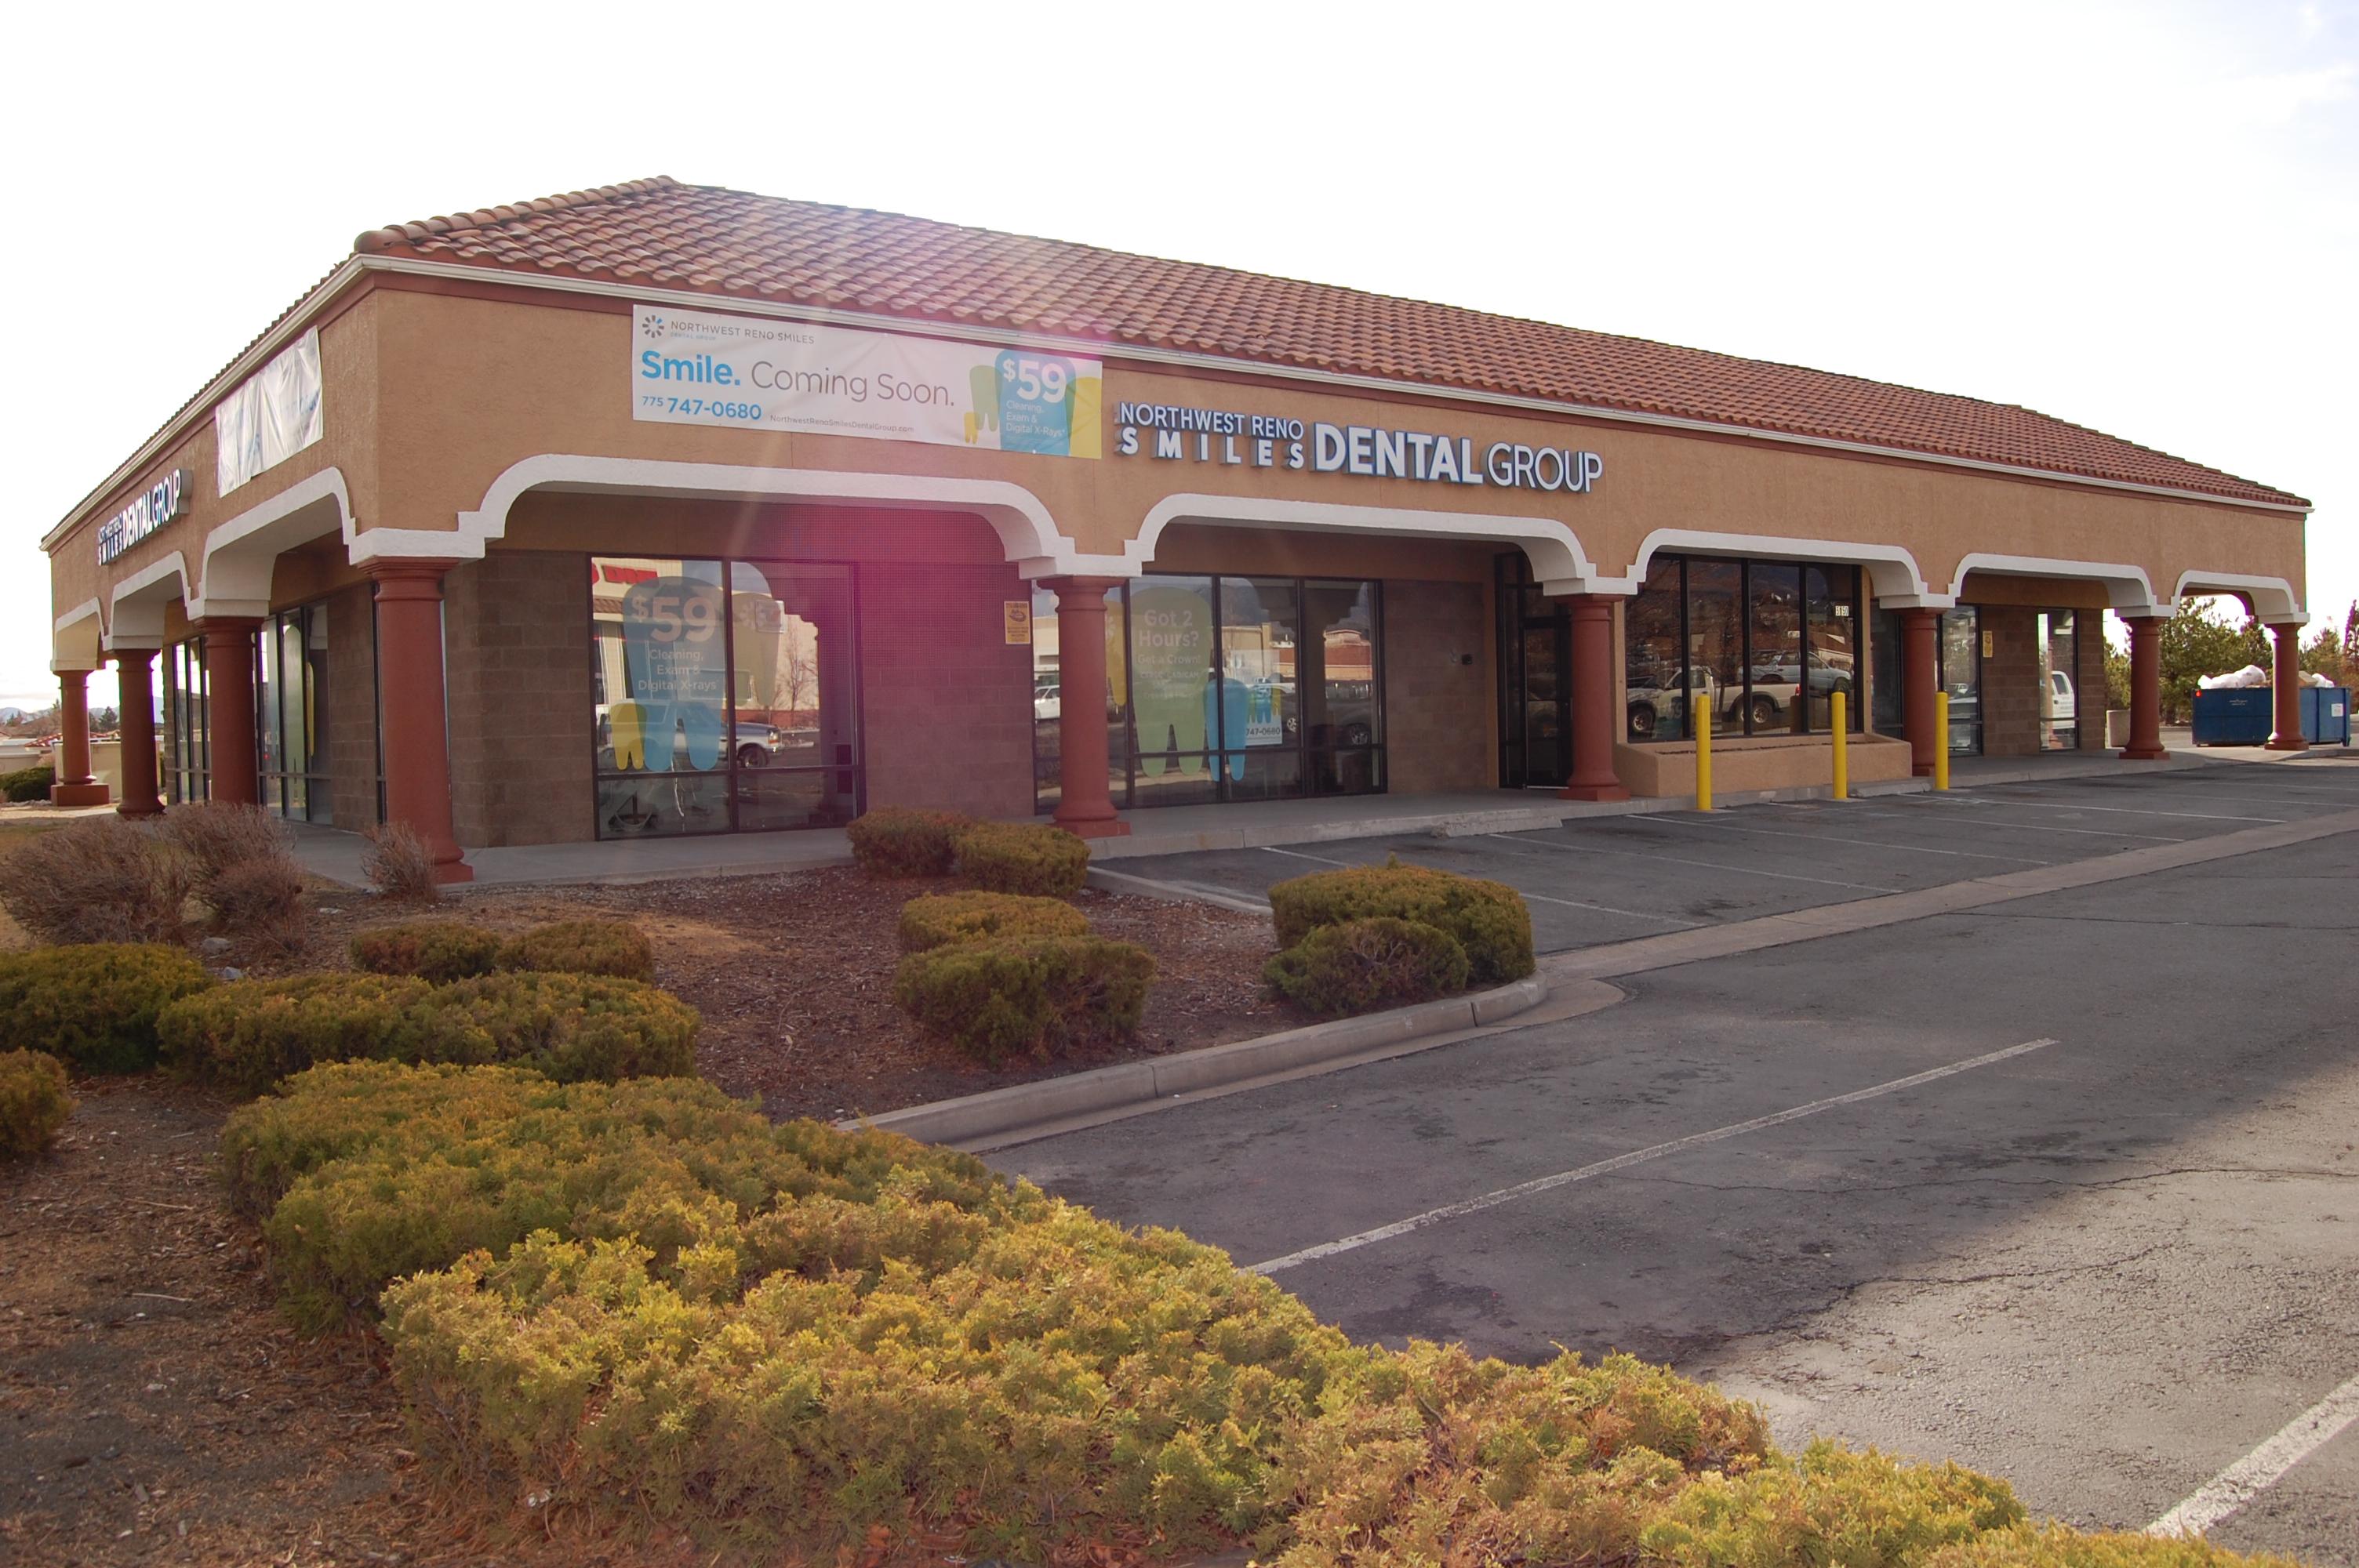 Northwest Reno Smiles Dental Group image 15